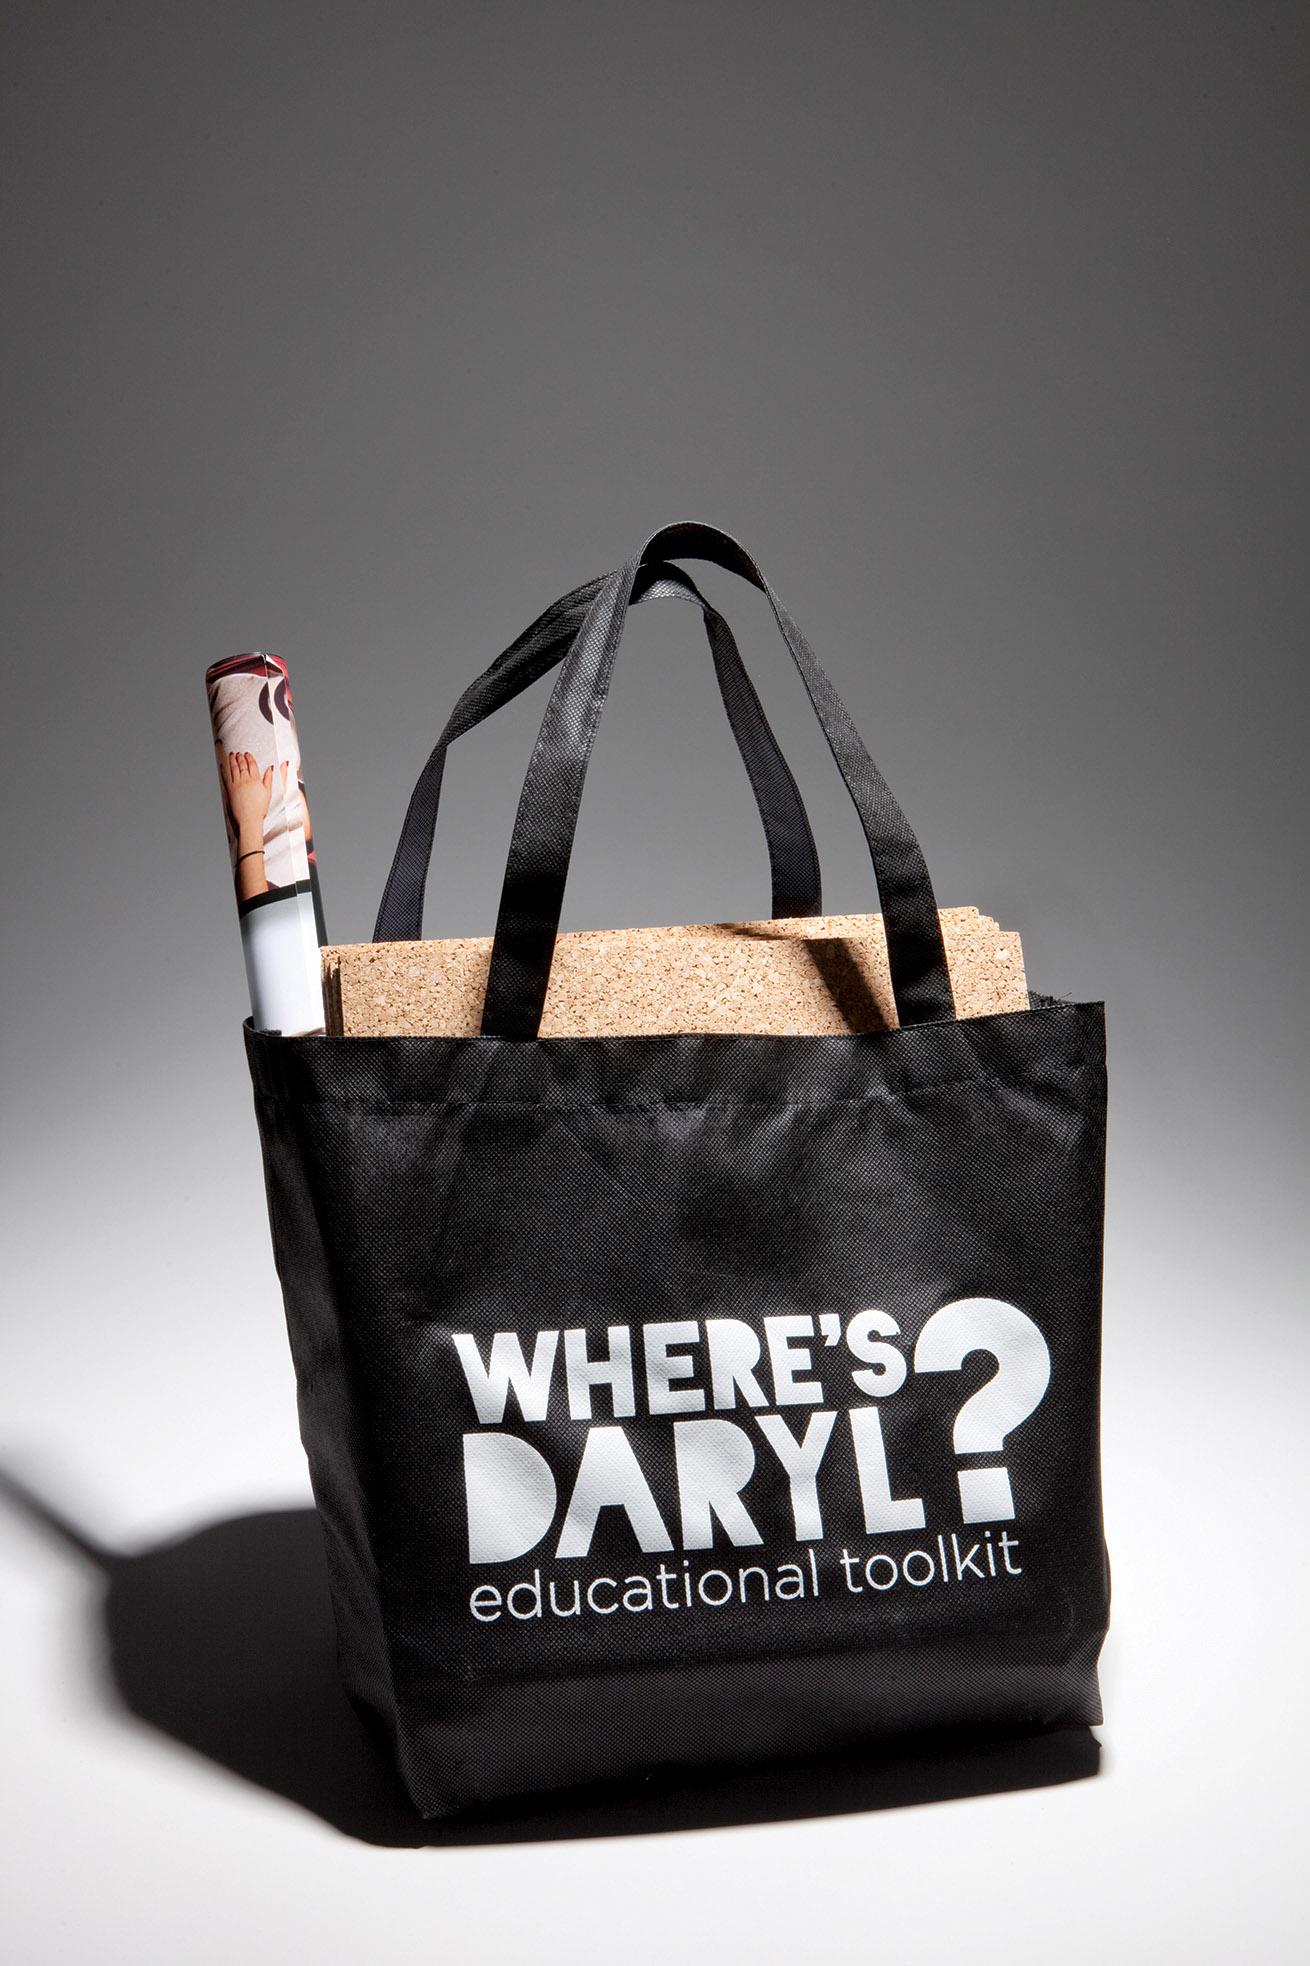 wheres_daryl-25_adj1